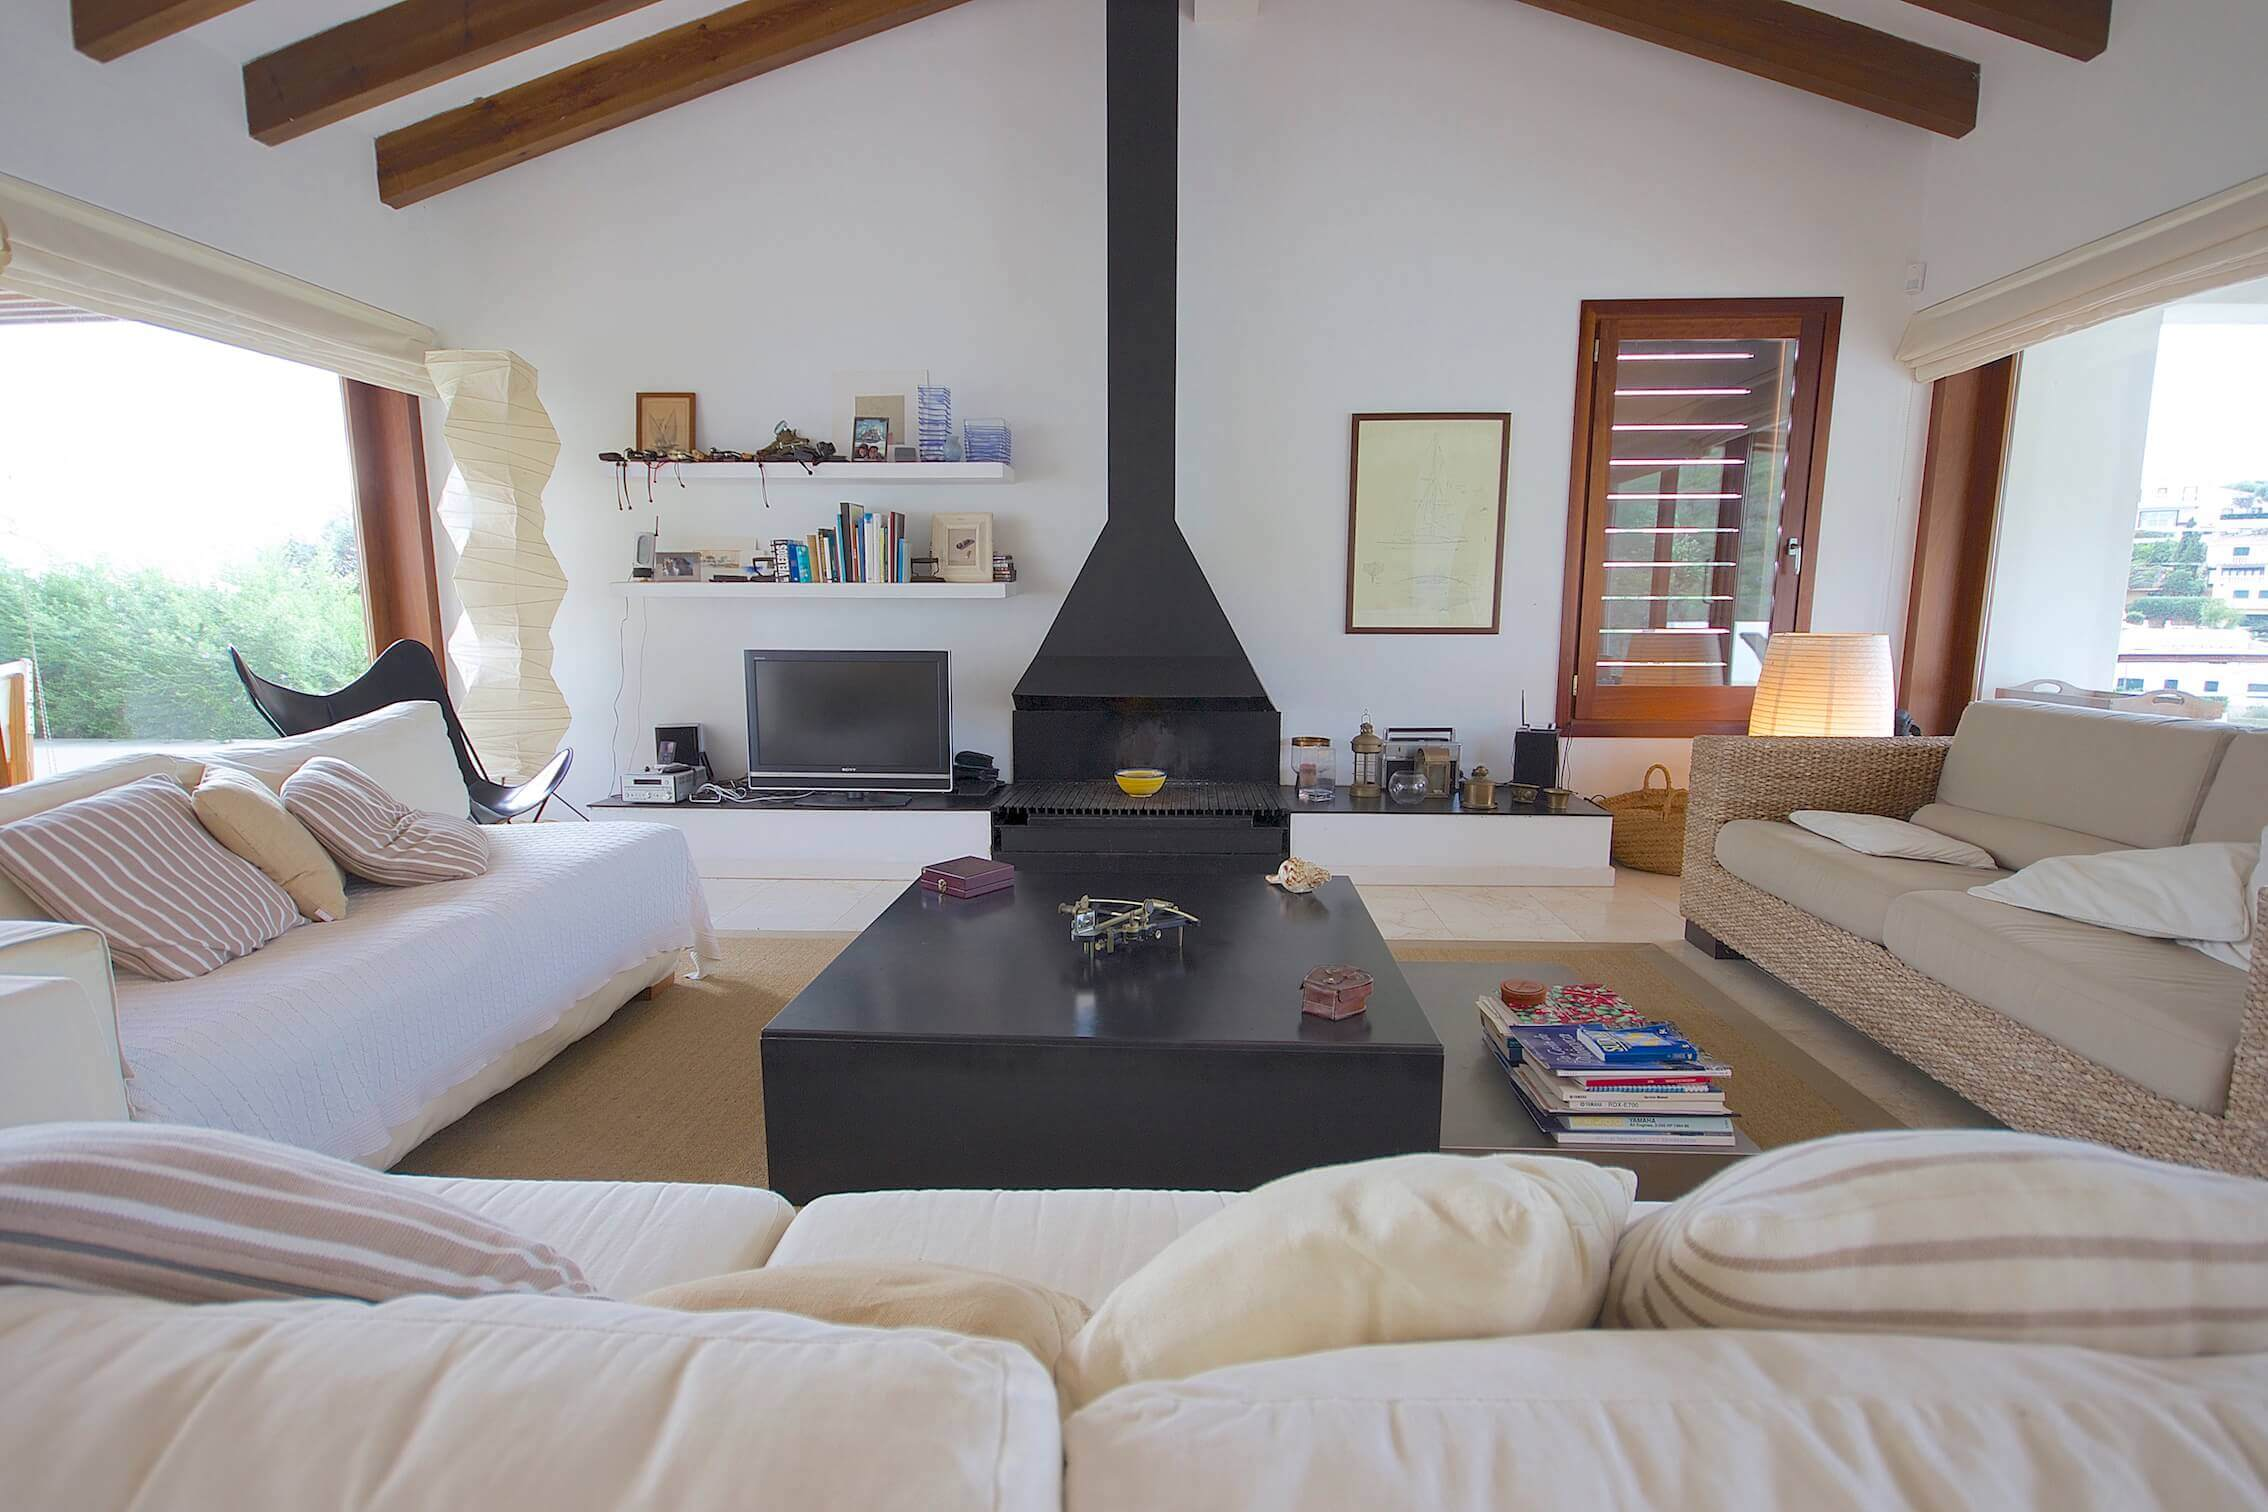 Fantasy fireplaces - Bonin sanso ...